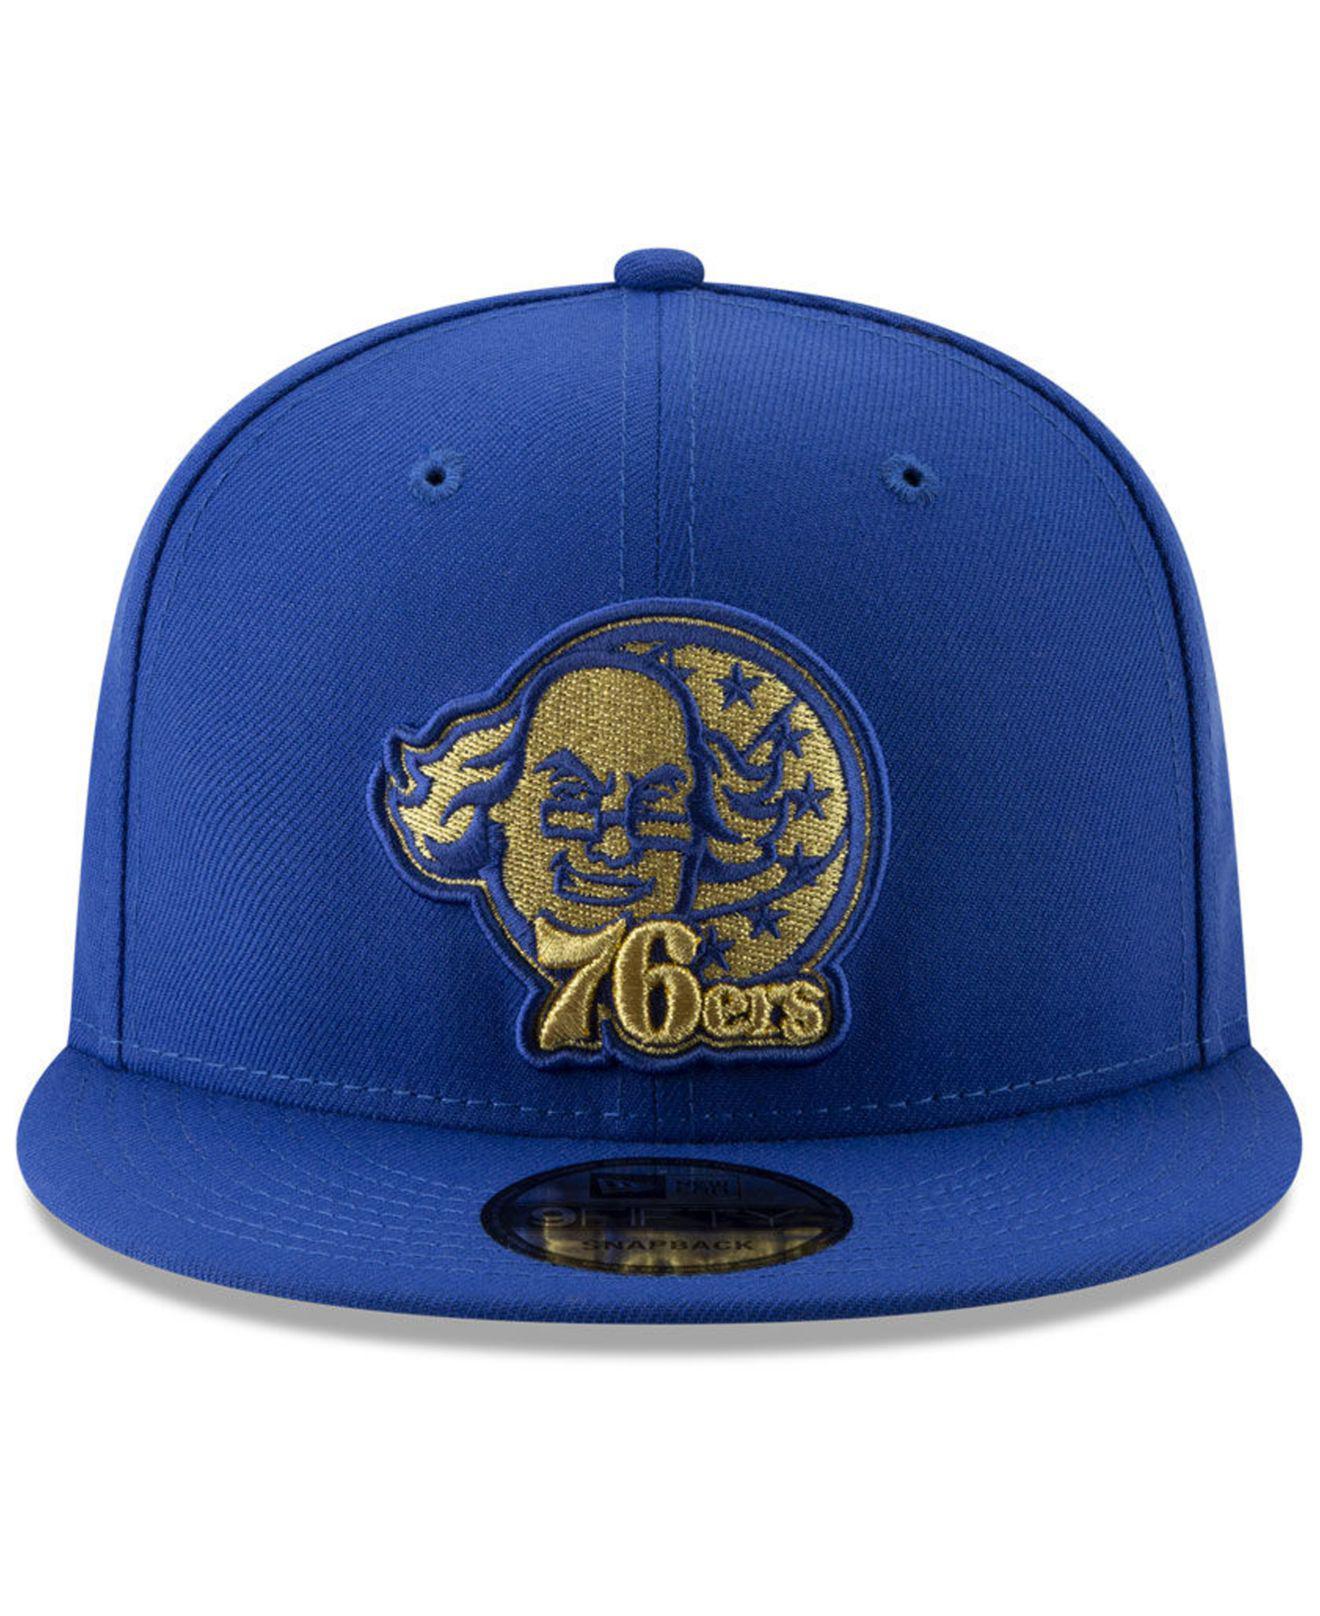 size 40 5c3e8 93e01 Lyst - KTZ Philadelphia 76ers Mishmash 9fifty Snapback Cap in Blue for Men